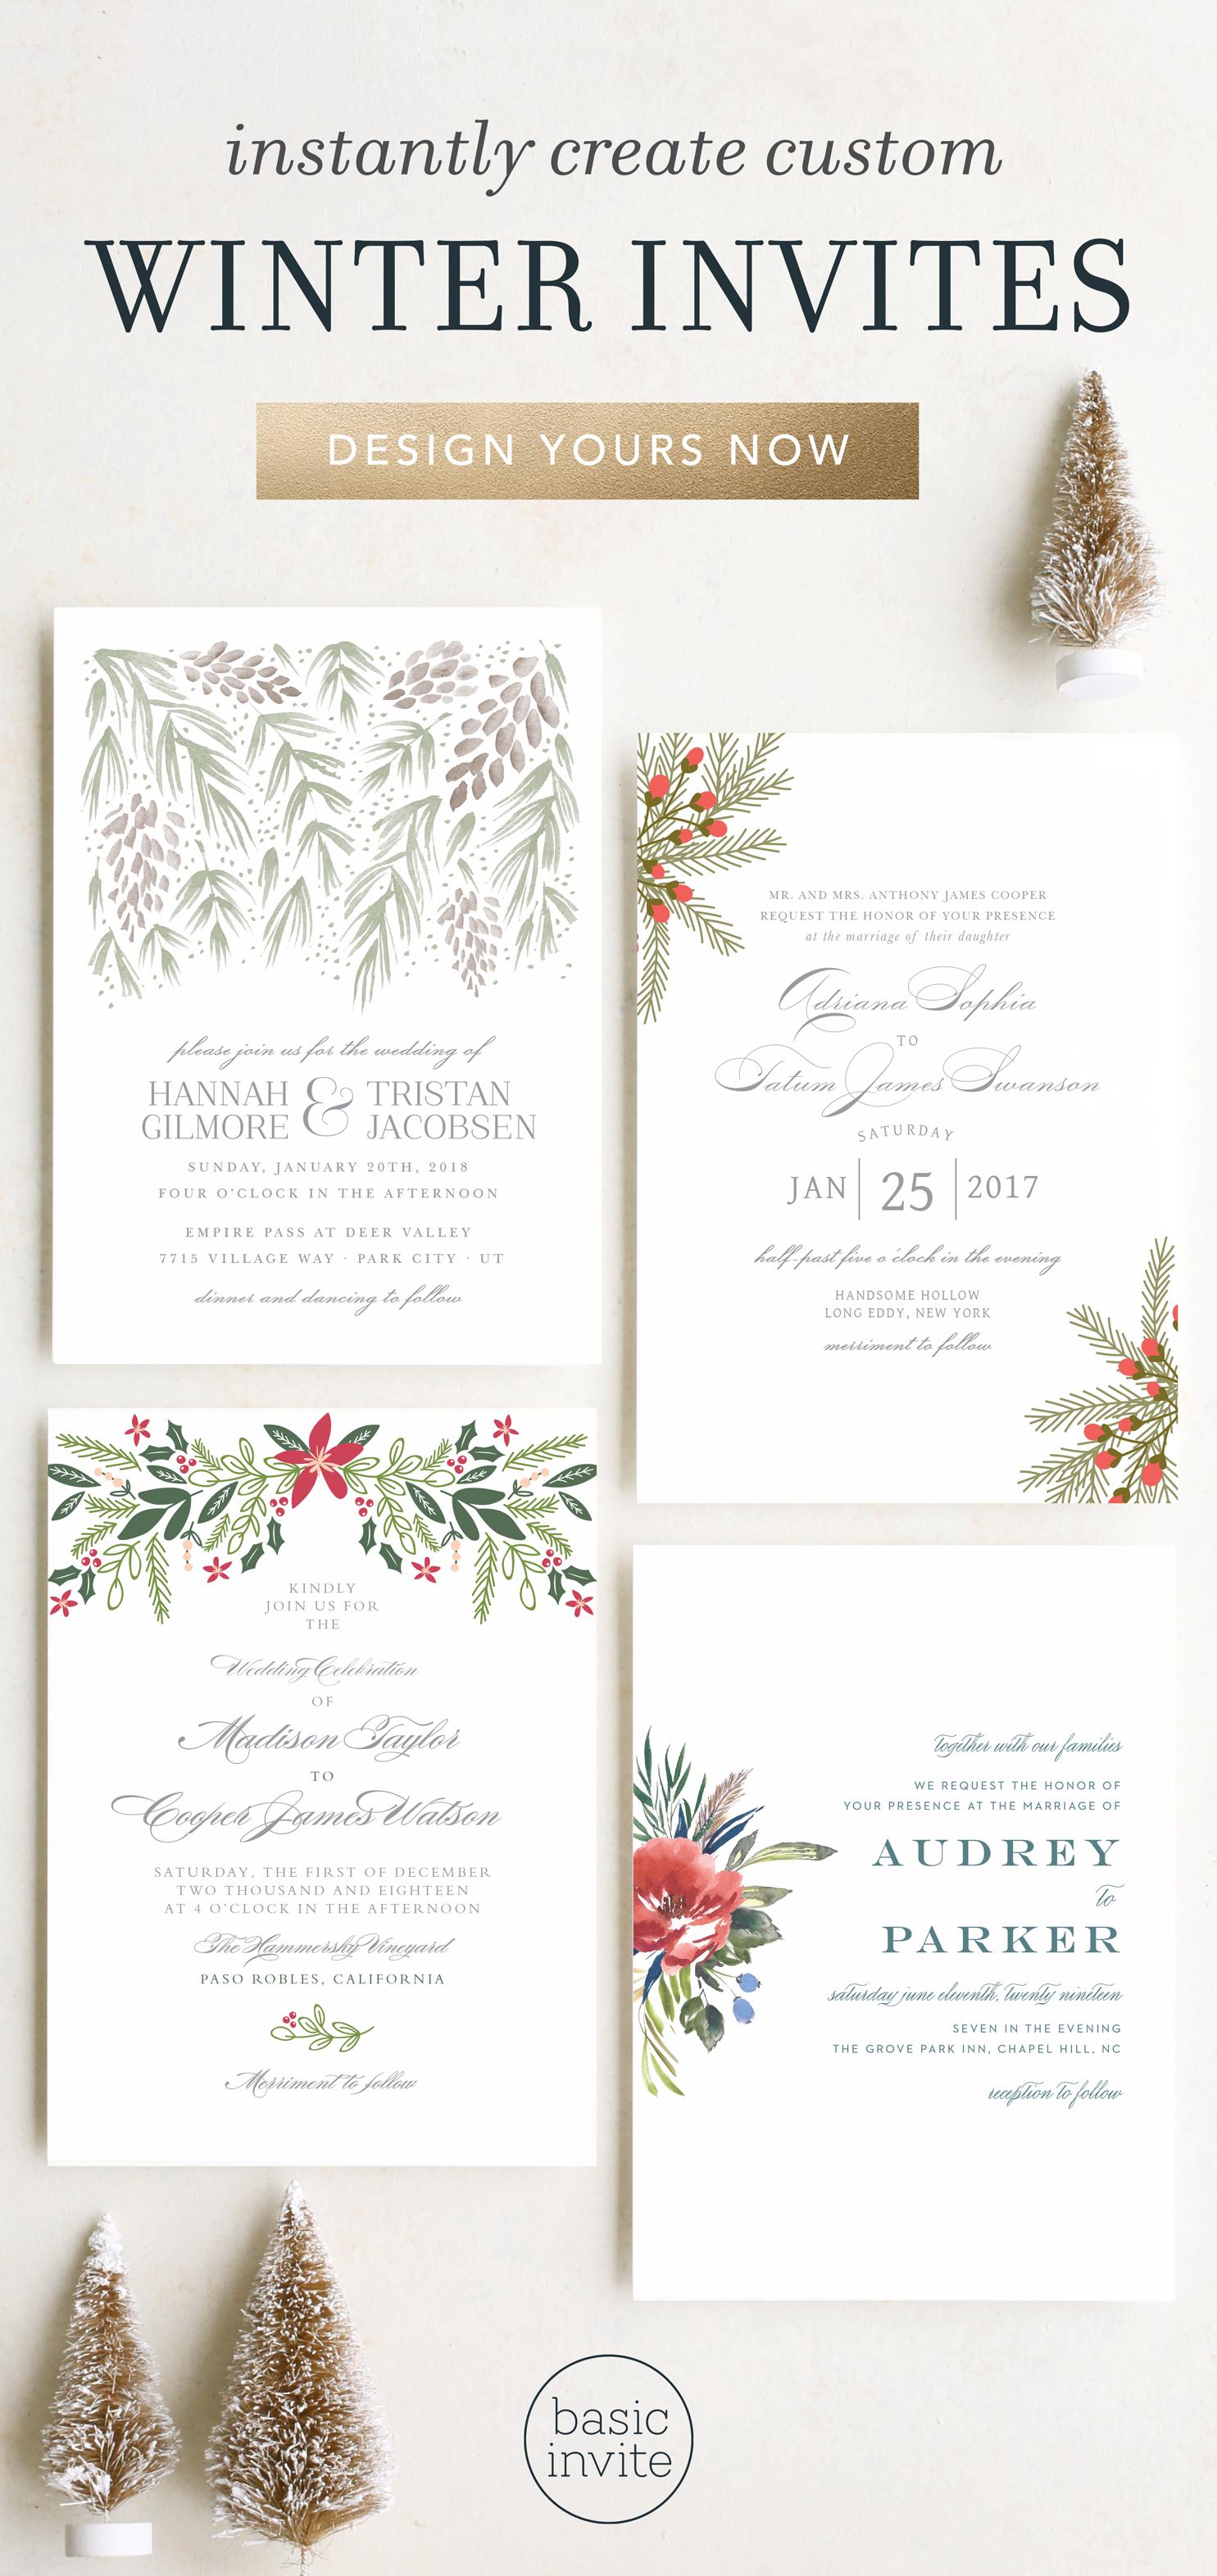 Winter Wedding Invitations Christmas Wedding Ideas Winter Wedding Ideas Floral Wedding Invitations Winter Wedding Invitations Christmas Wedding Invitations